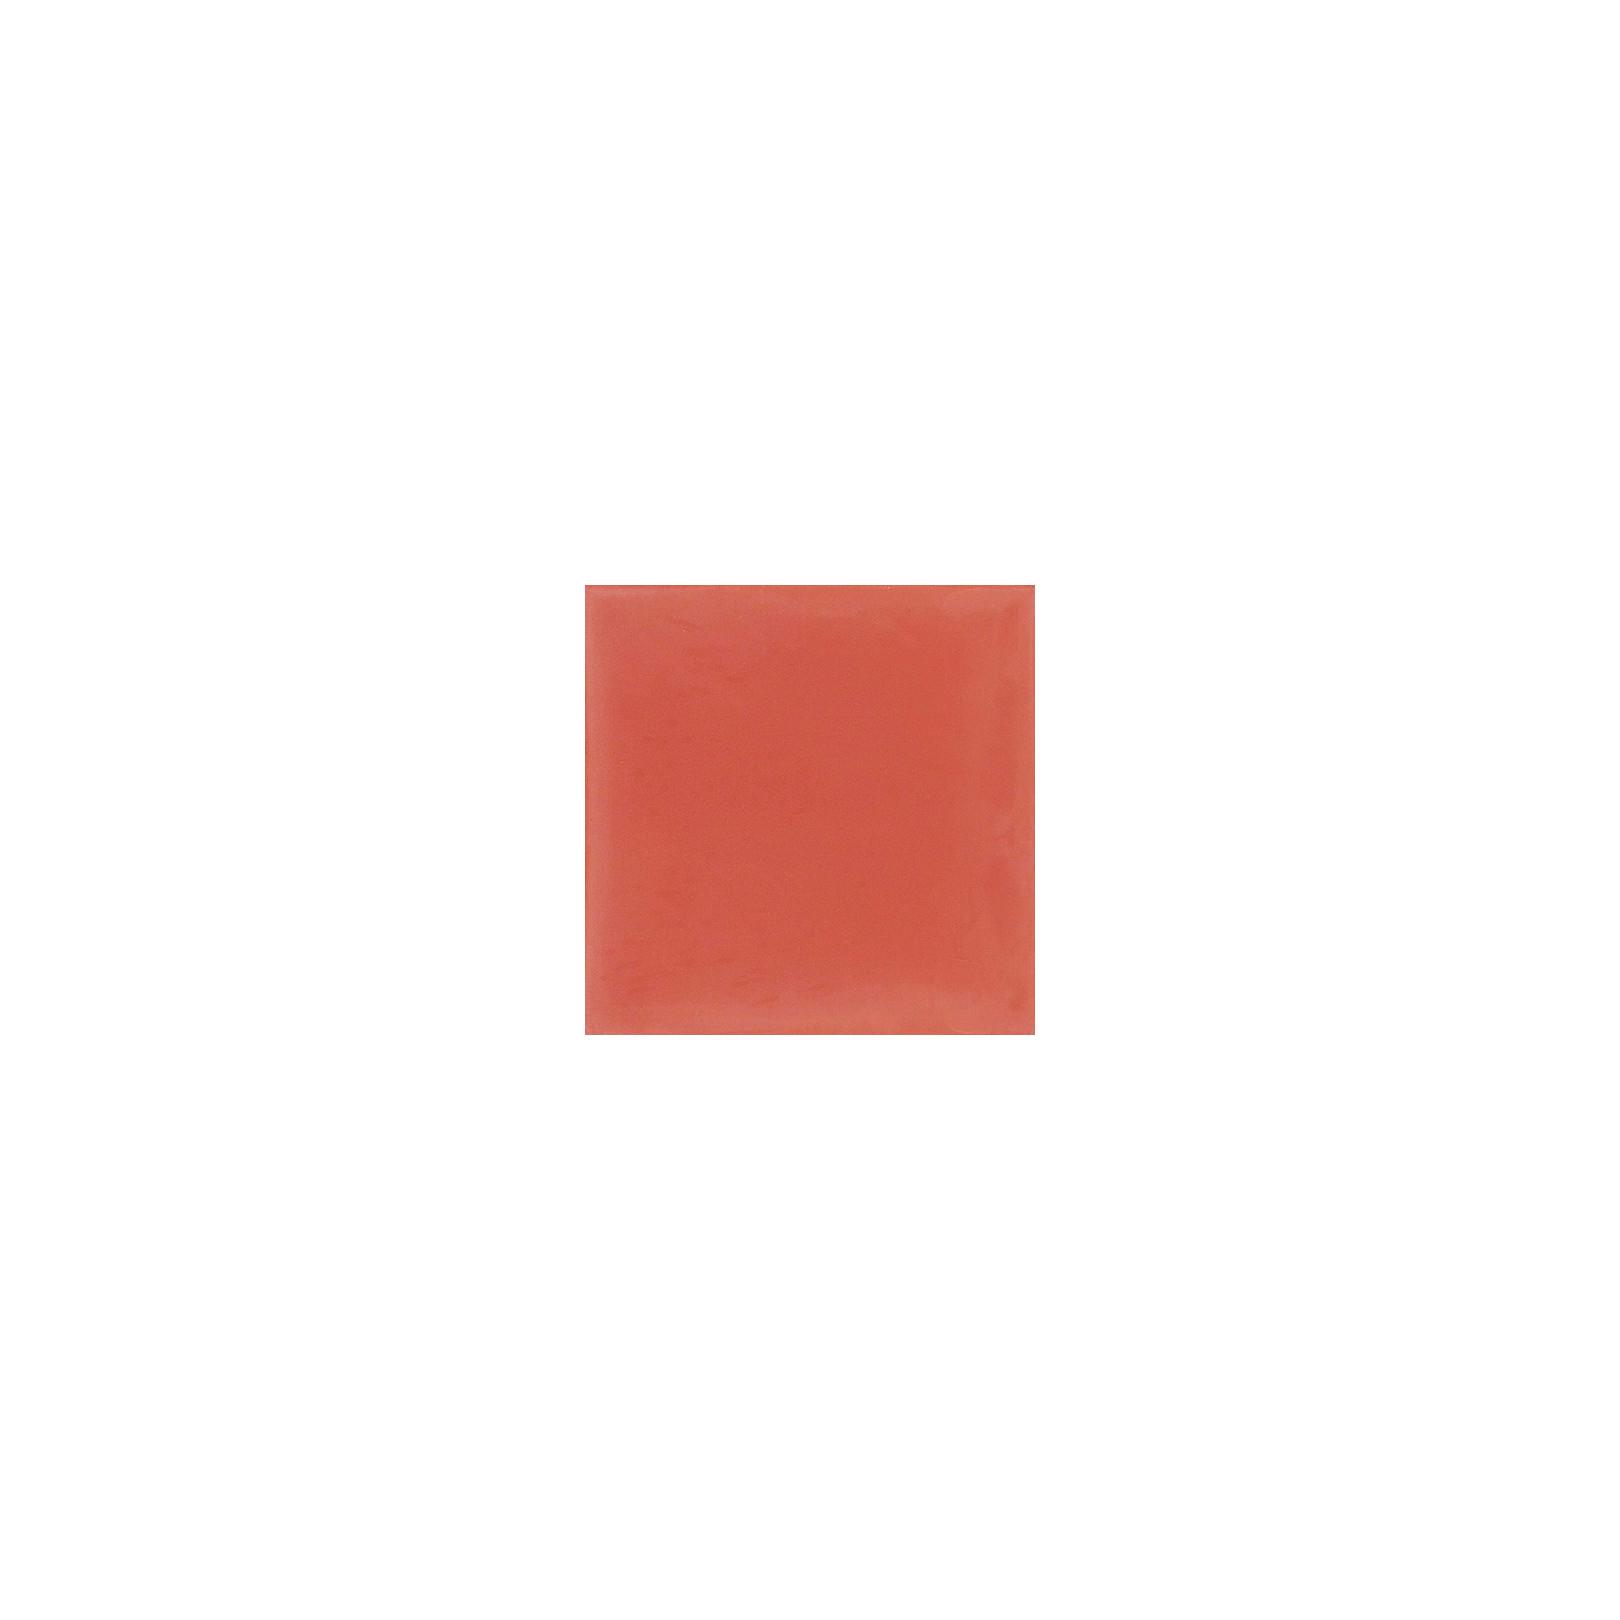 carreau de ciment color uni rouge u14 casalux home design. Black Bedroom Furniture Sets. Home Design Ideas